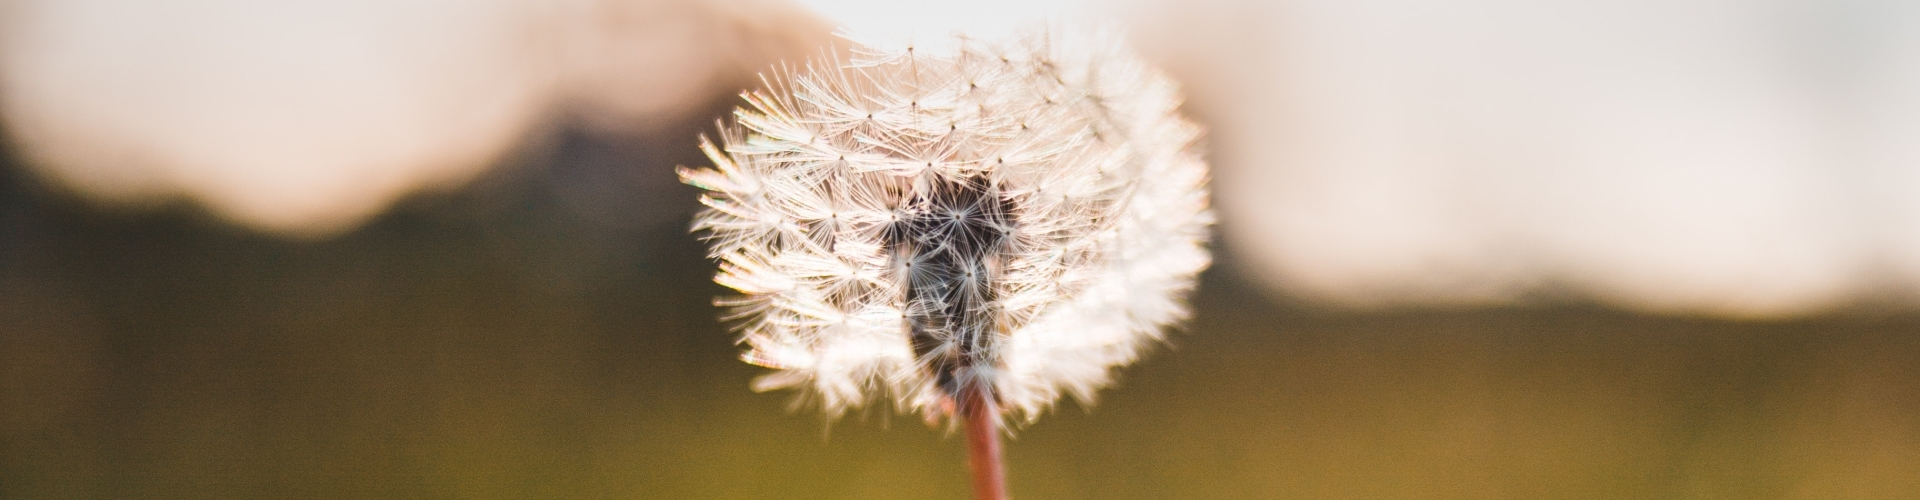 Wandelen, mindfulness en ademhaling